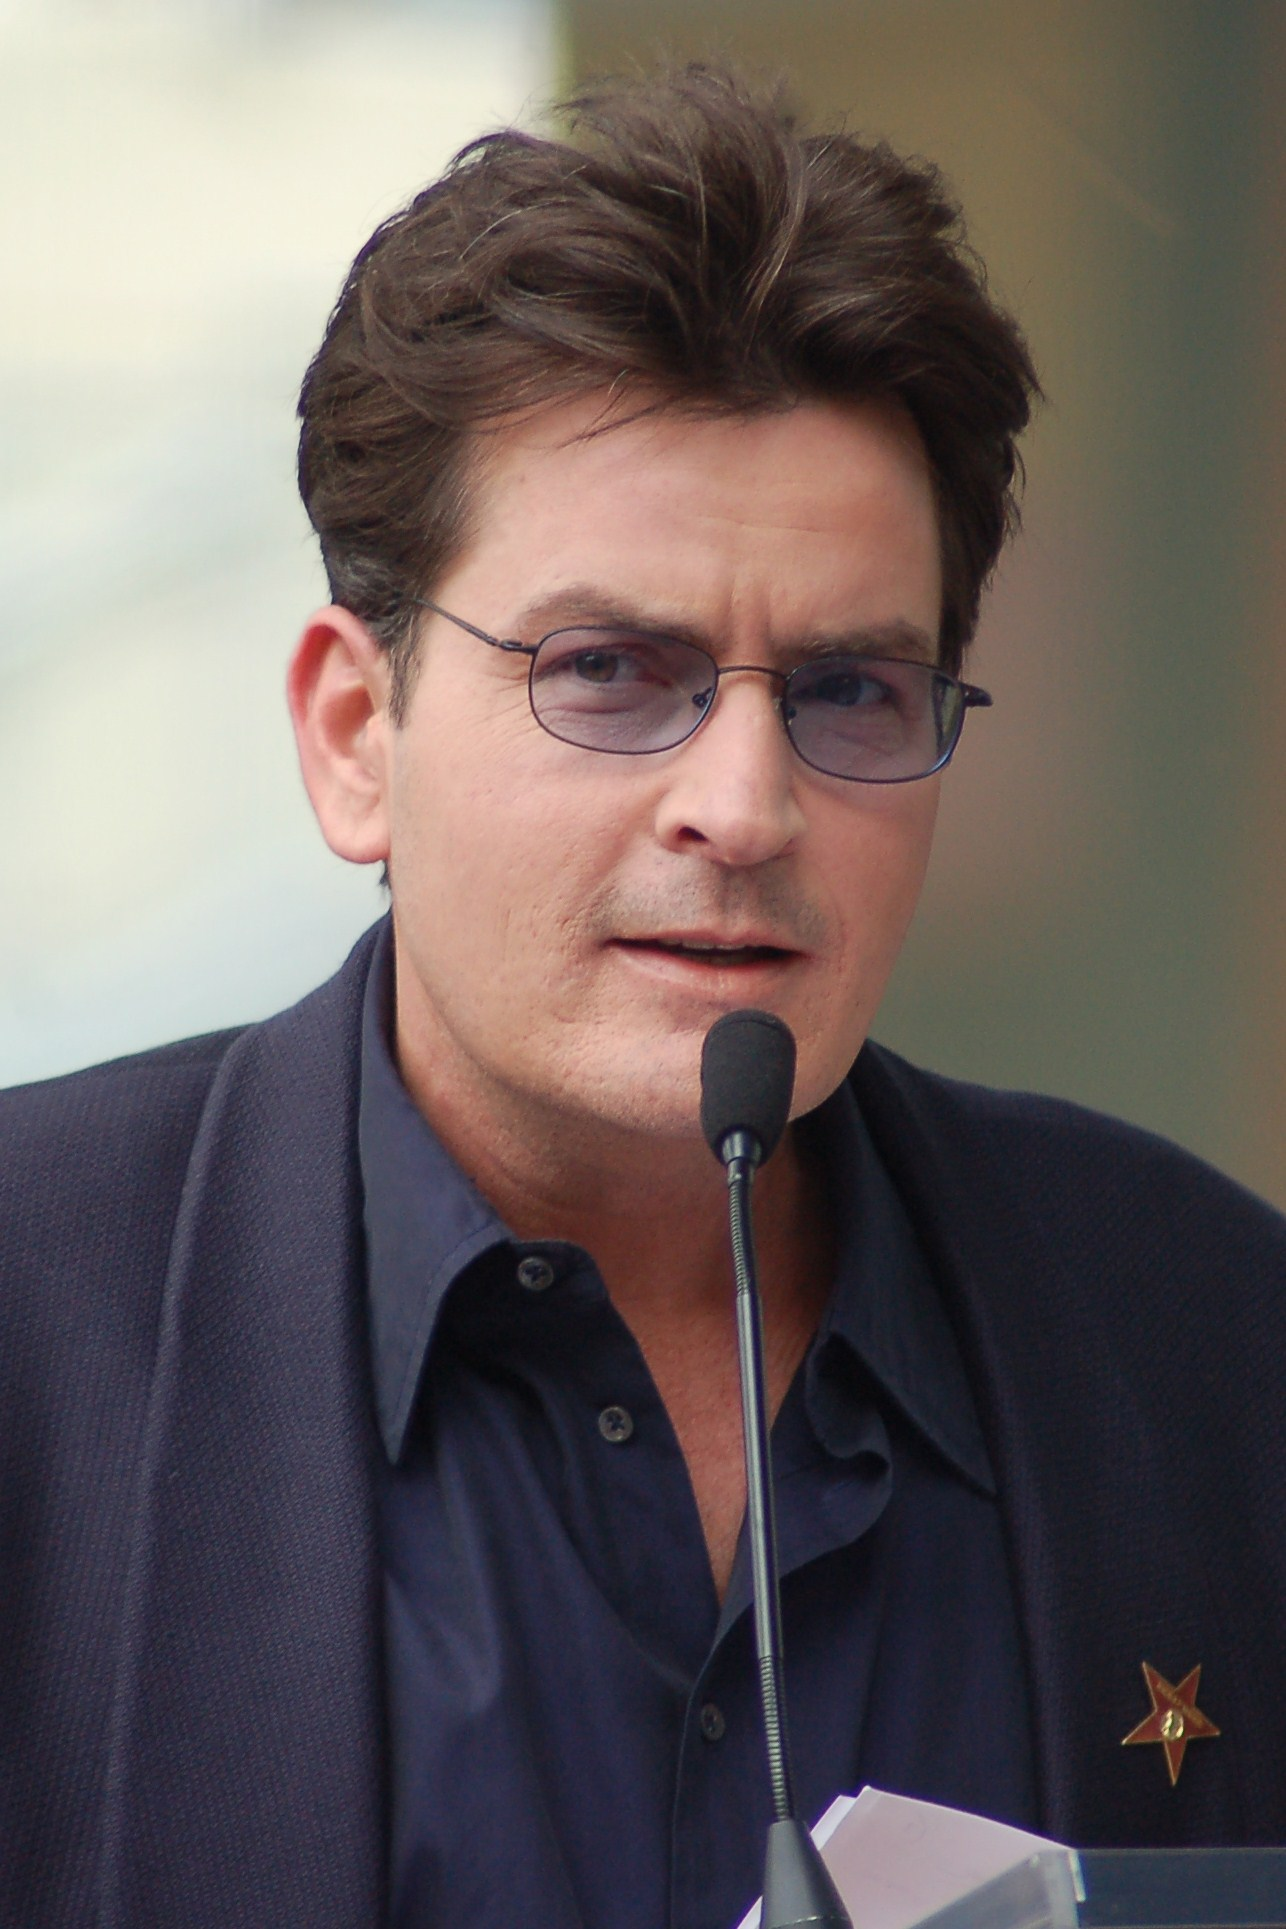 Charlie Sheen wearing black specs and black blazer.